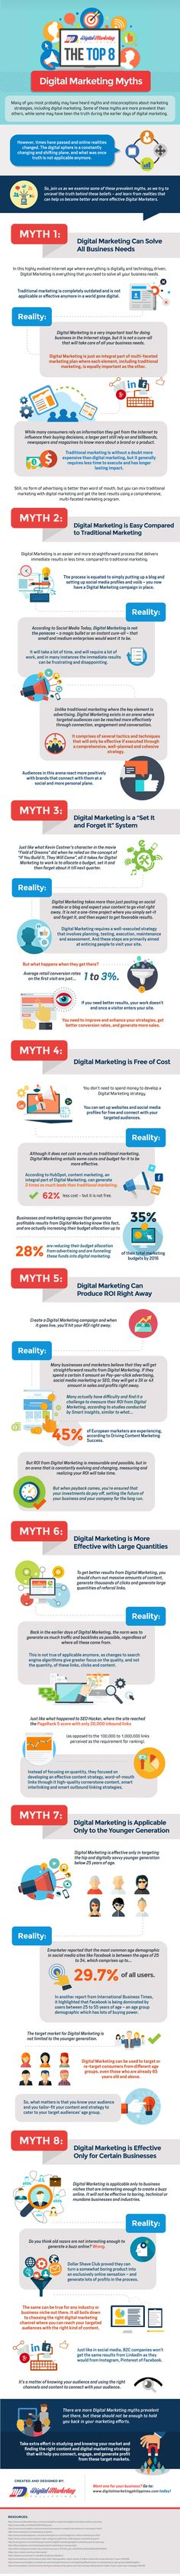 The Top 8 Digital Marketing Myths #webmarketing